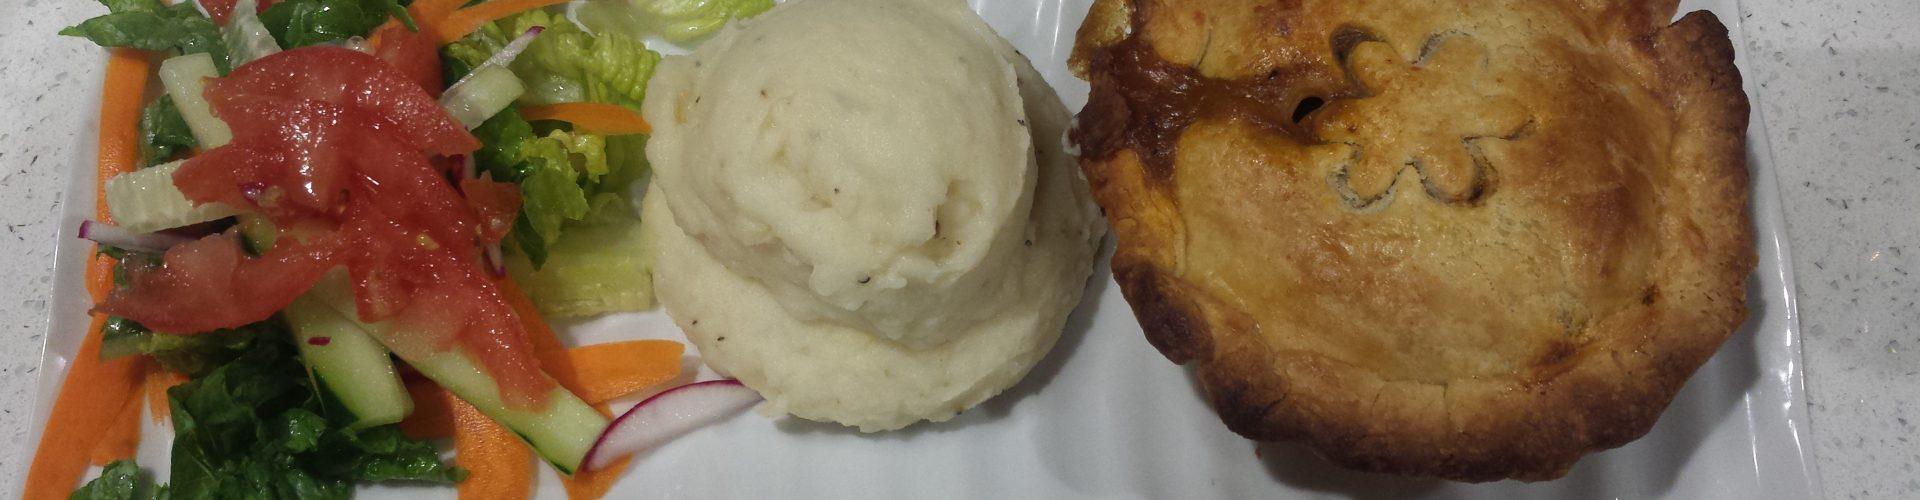 Savory Pie meal